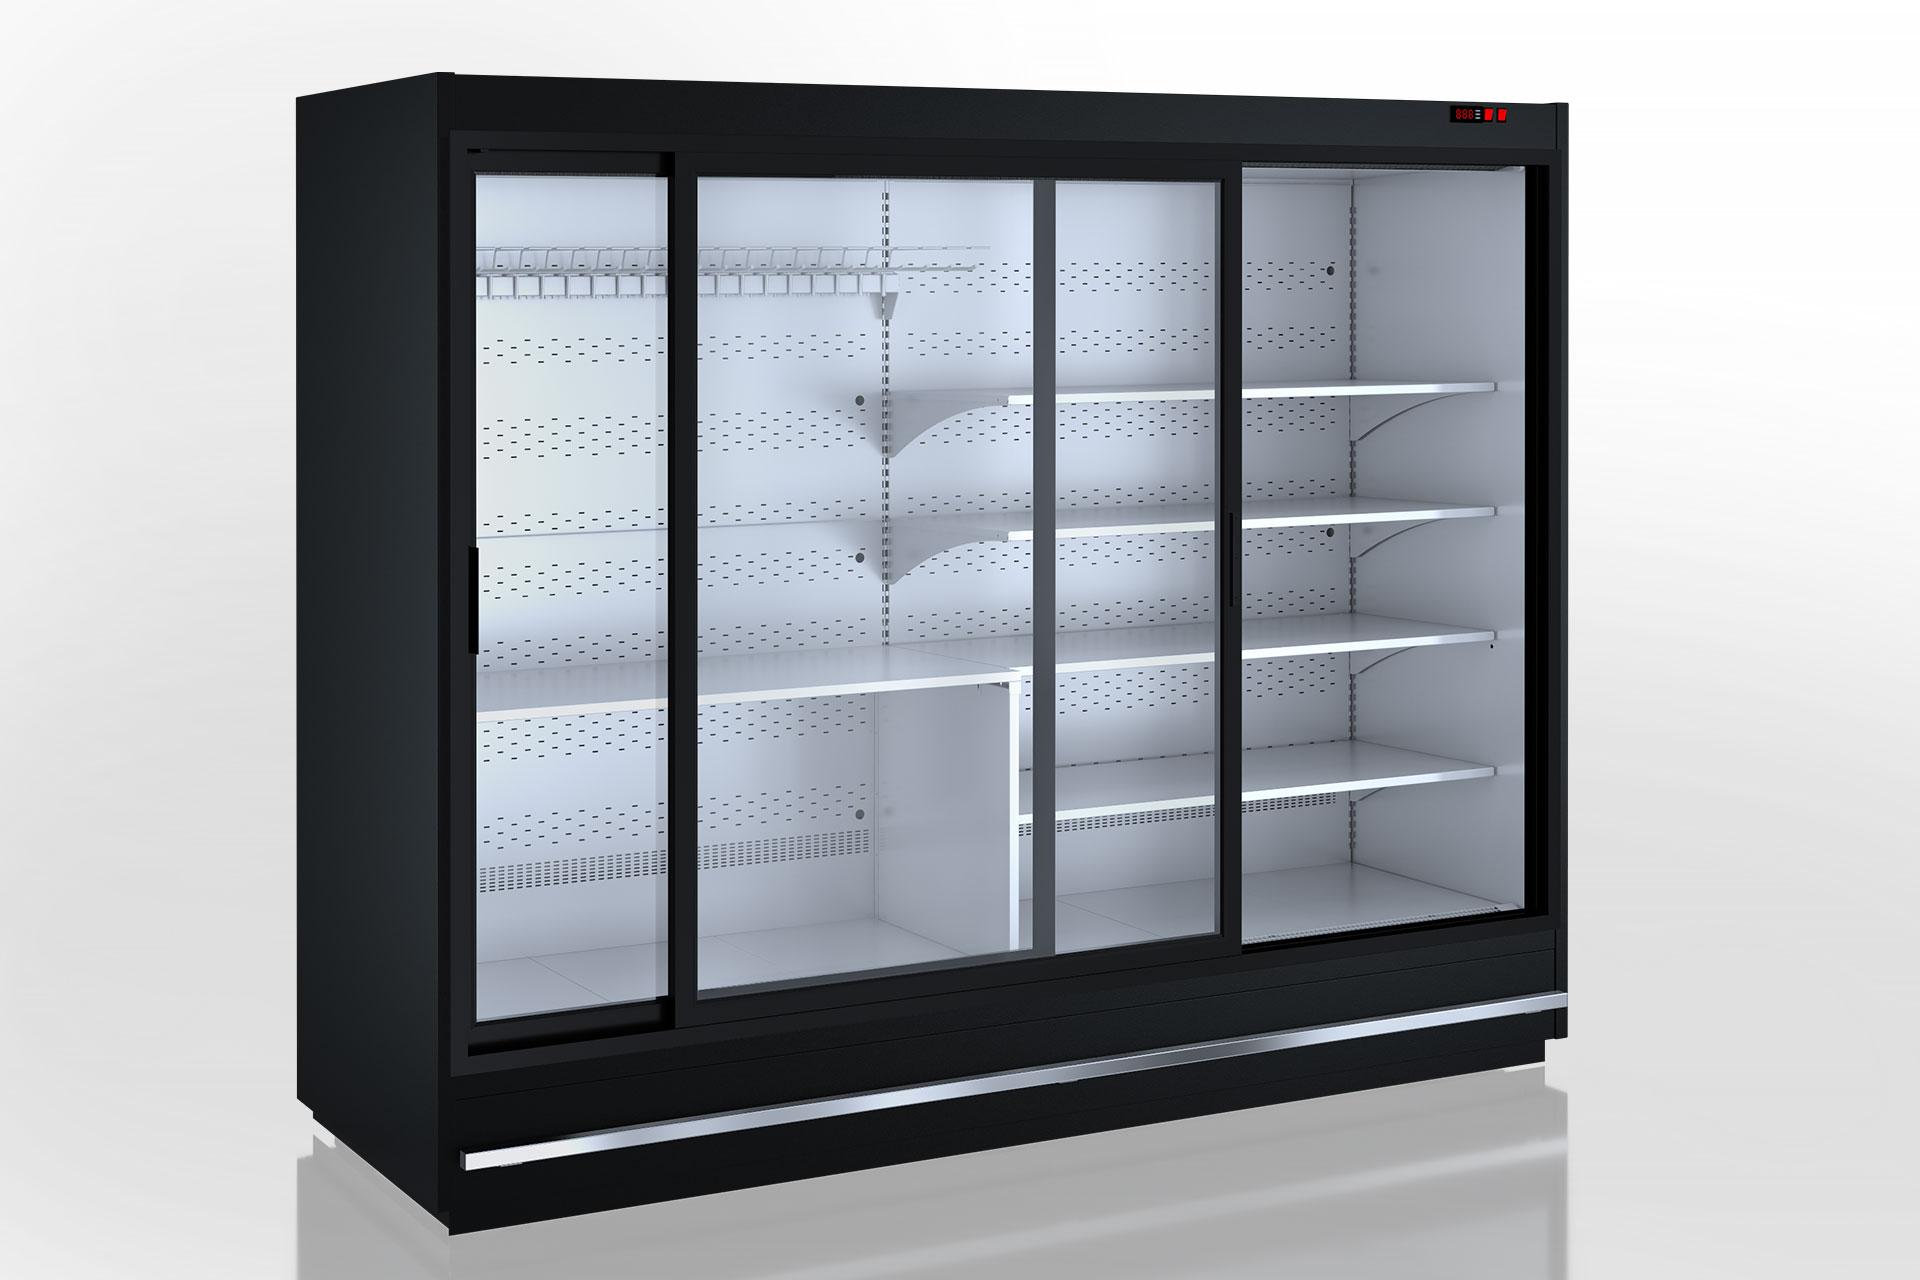 Специализированная витрина для продажи мяса Indiana MV 080 meat D 205-DLM